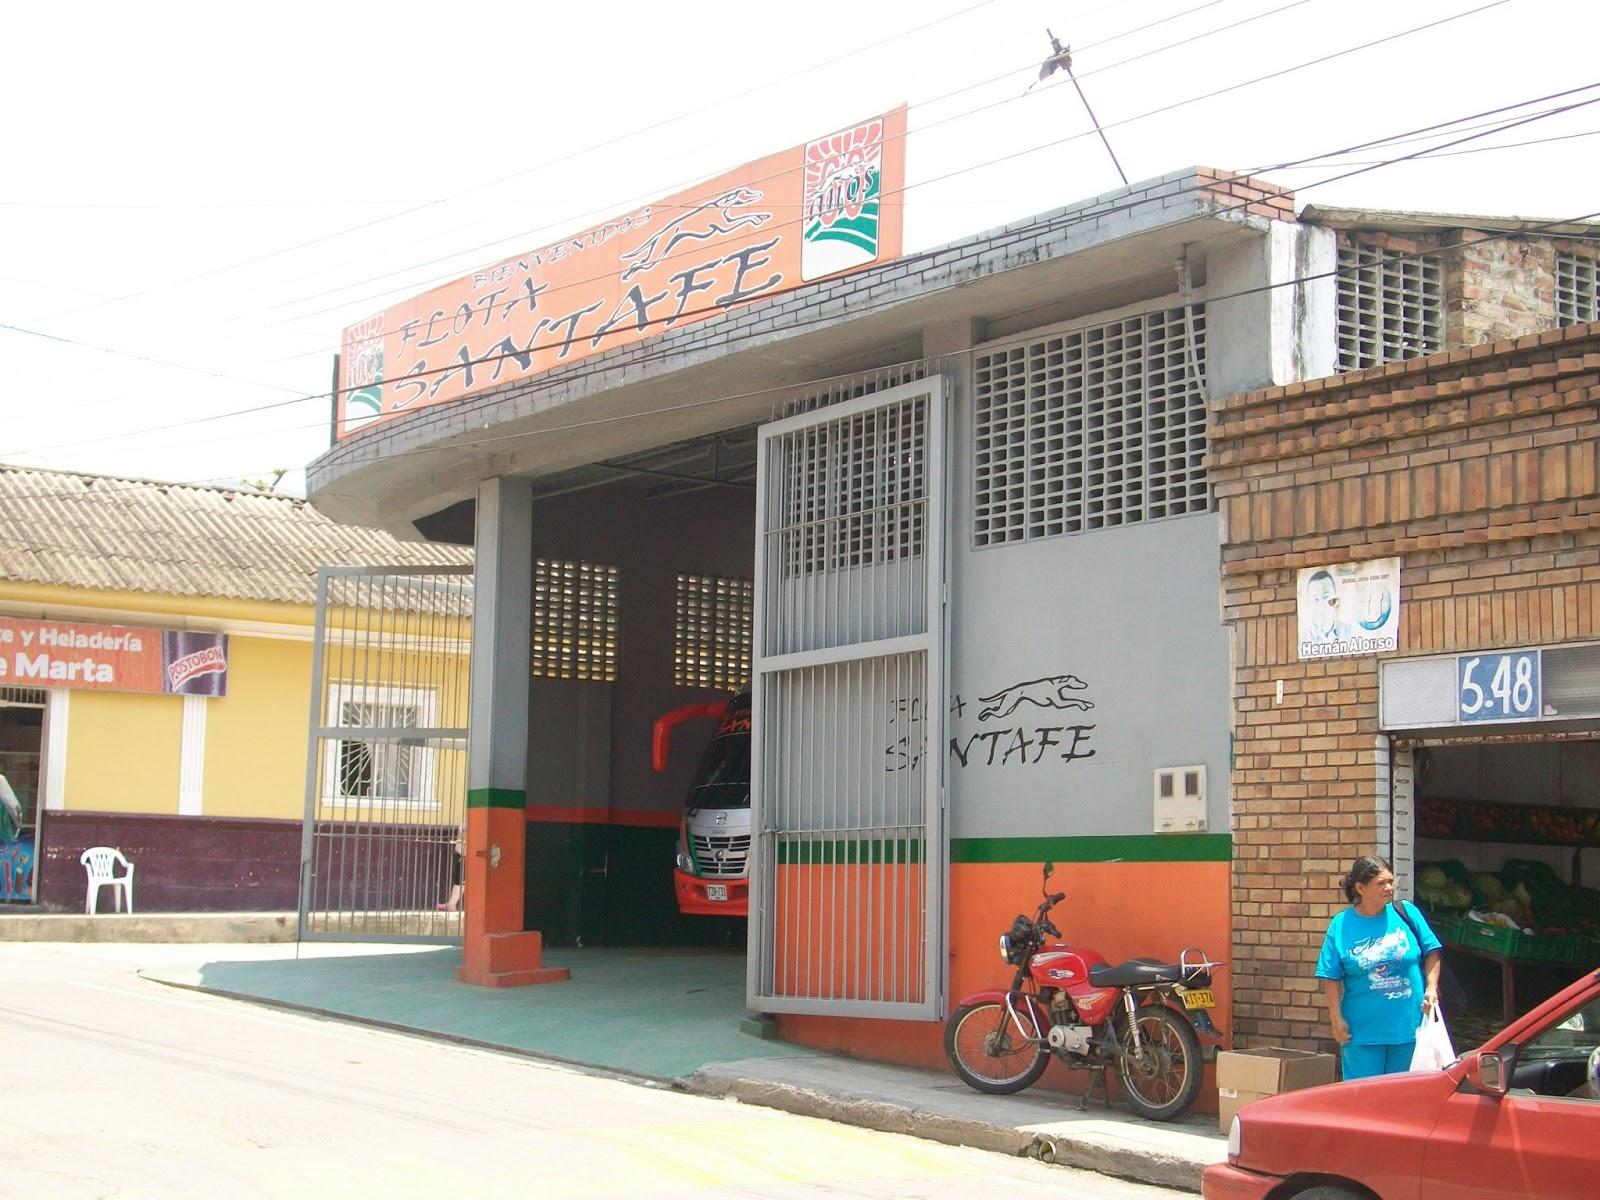 Villeta cundinamarca colombia transporte principal - Centro de salud vistalegre la flota ...